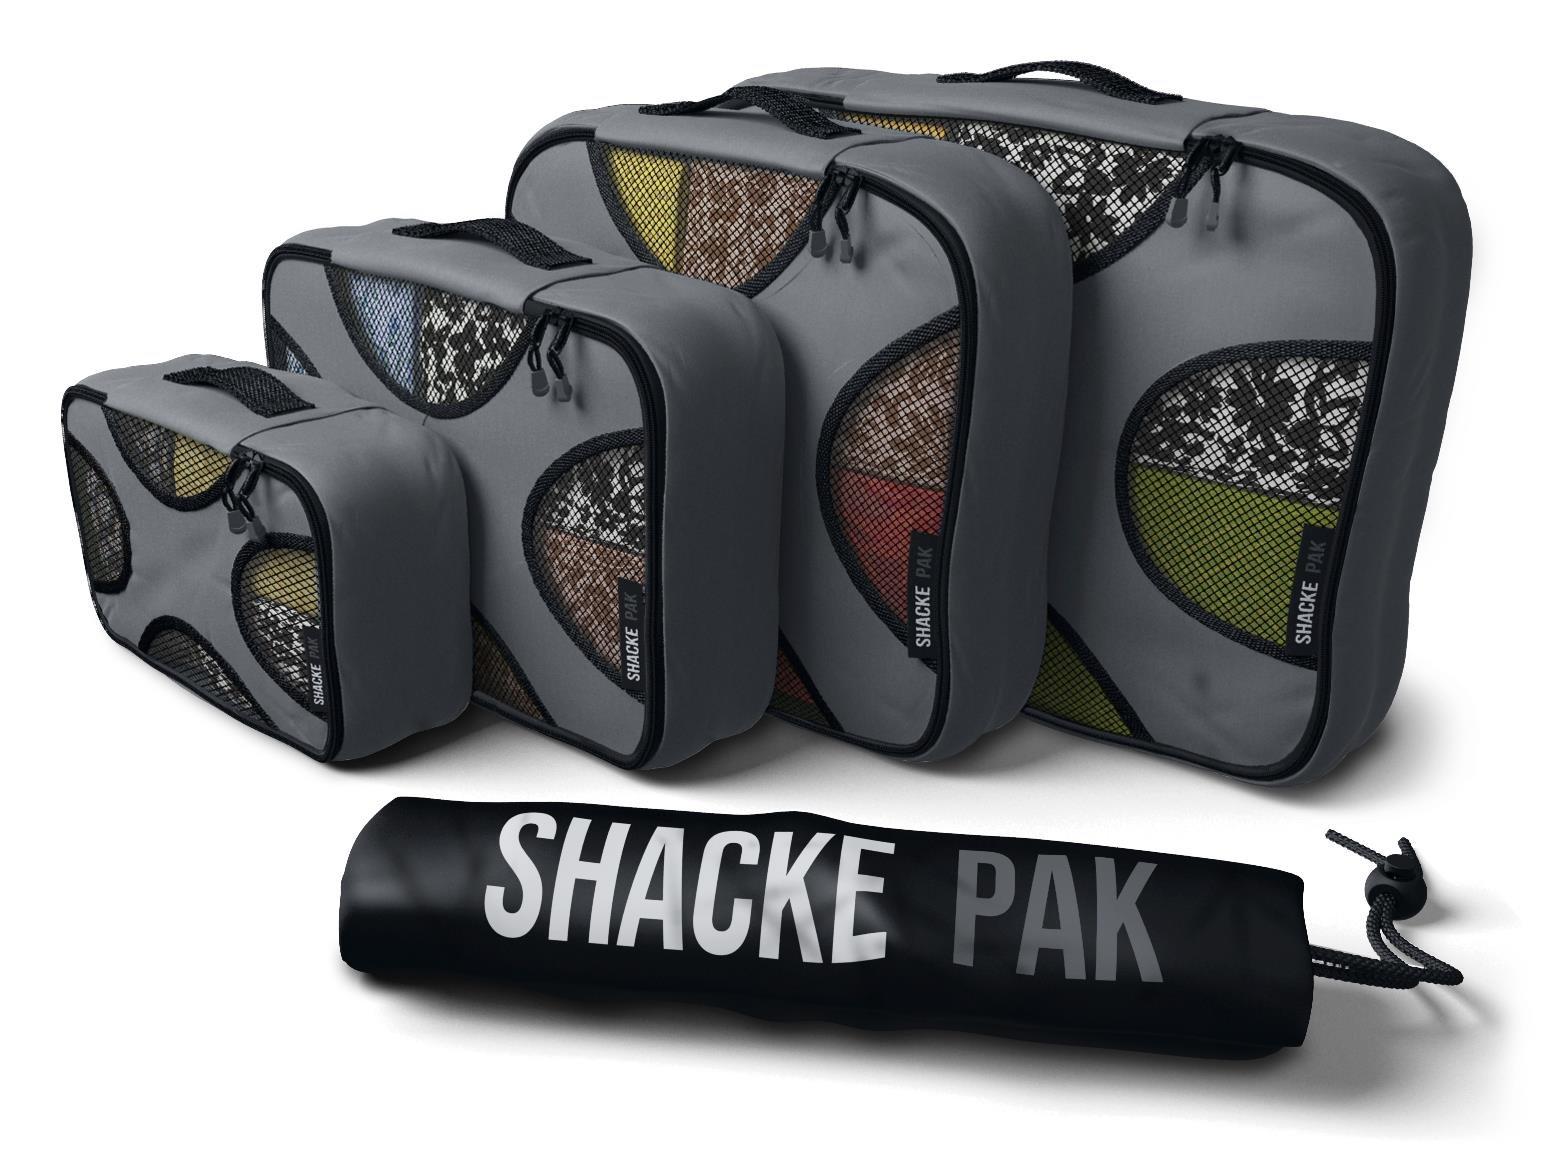 Shacke Pak - 4 Set Packing Cubes - Travel Organizers with Laundry Bag (Dark Grey)